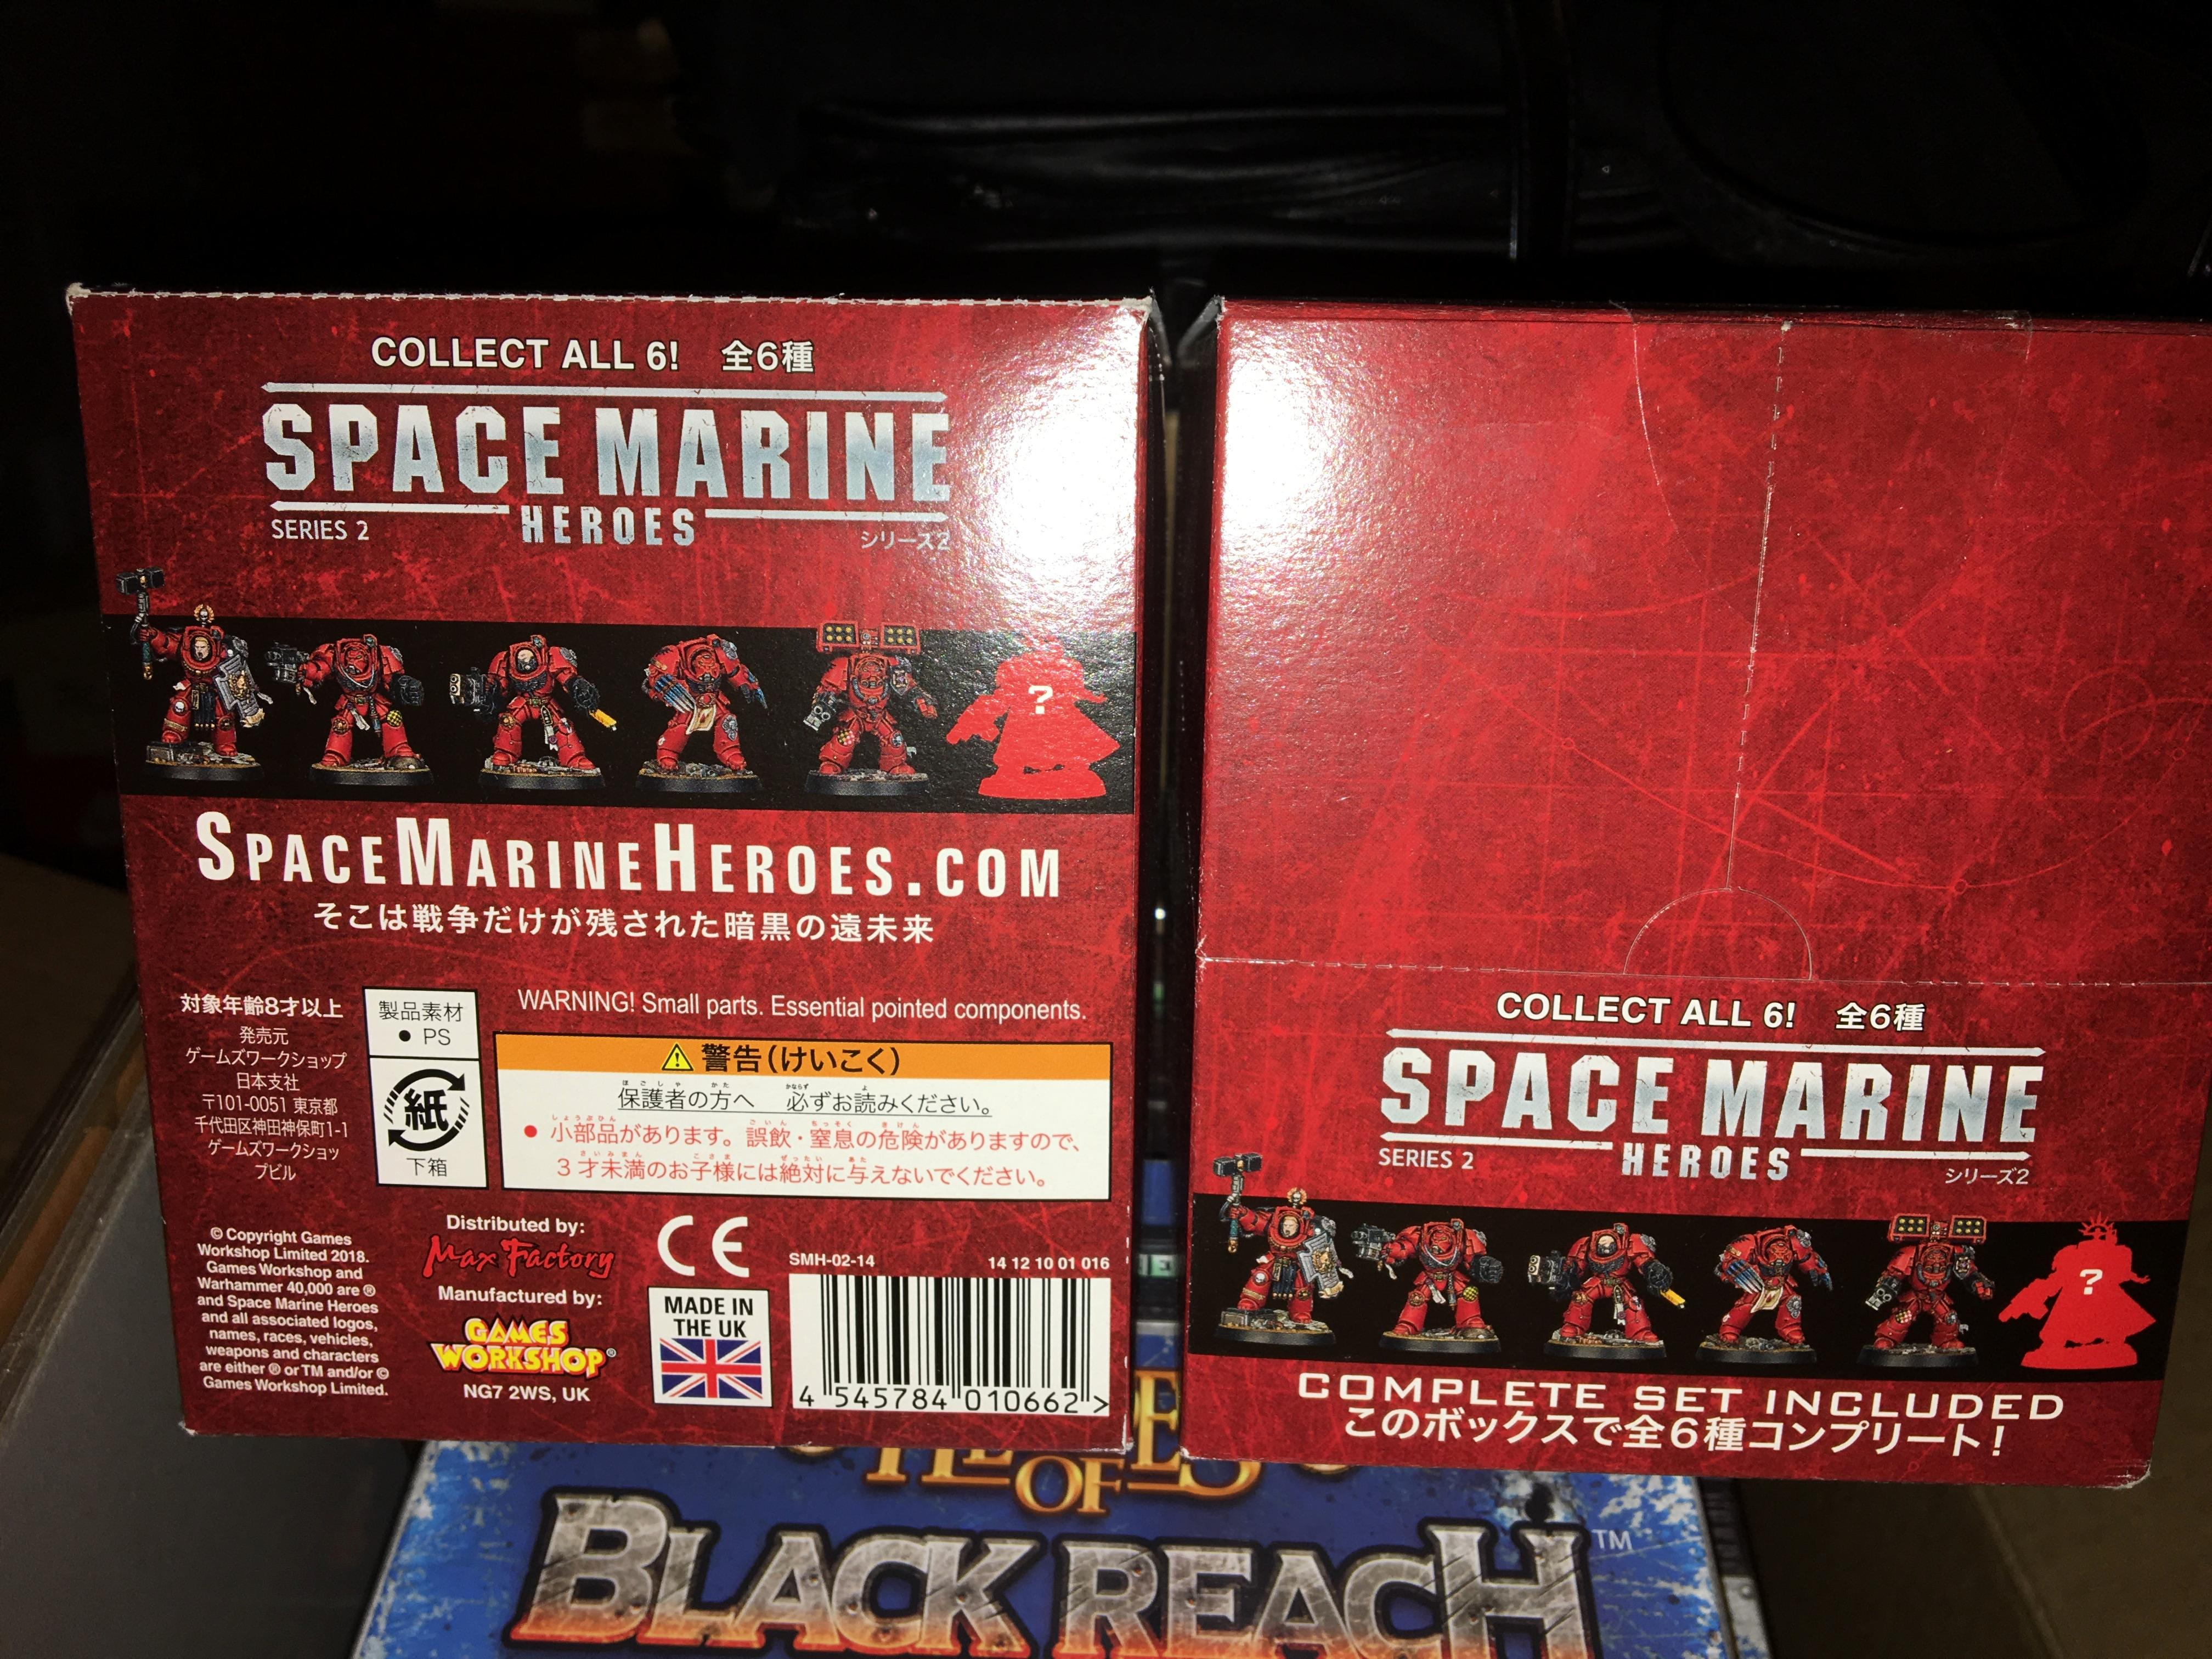 2 boxes worth